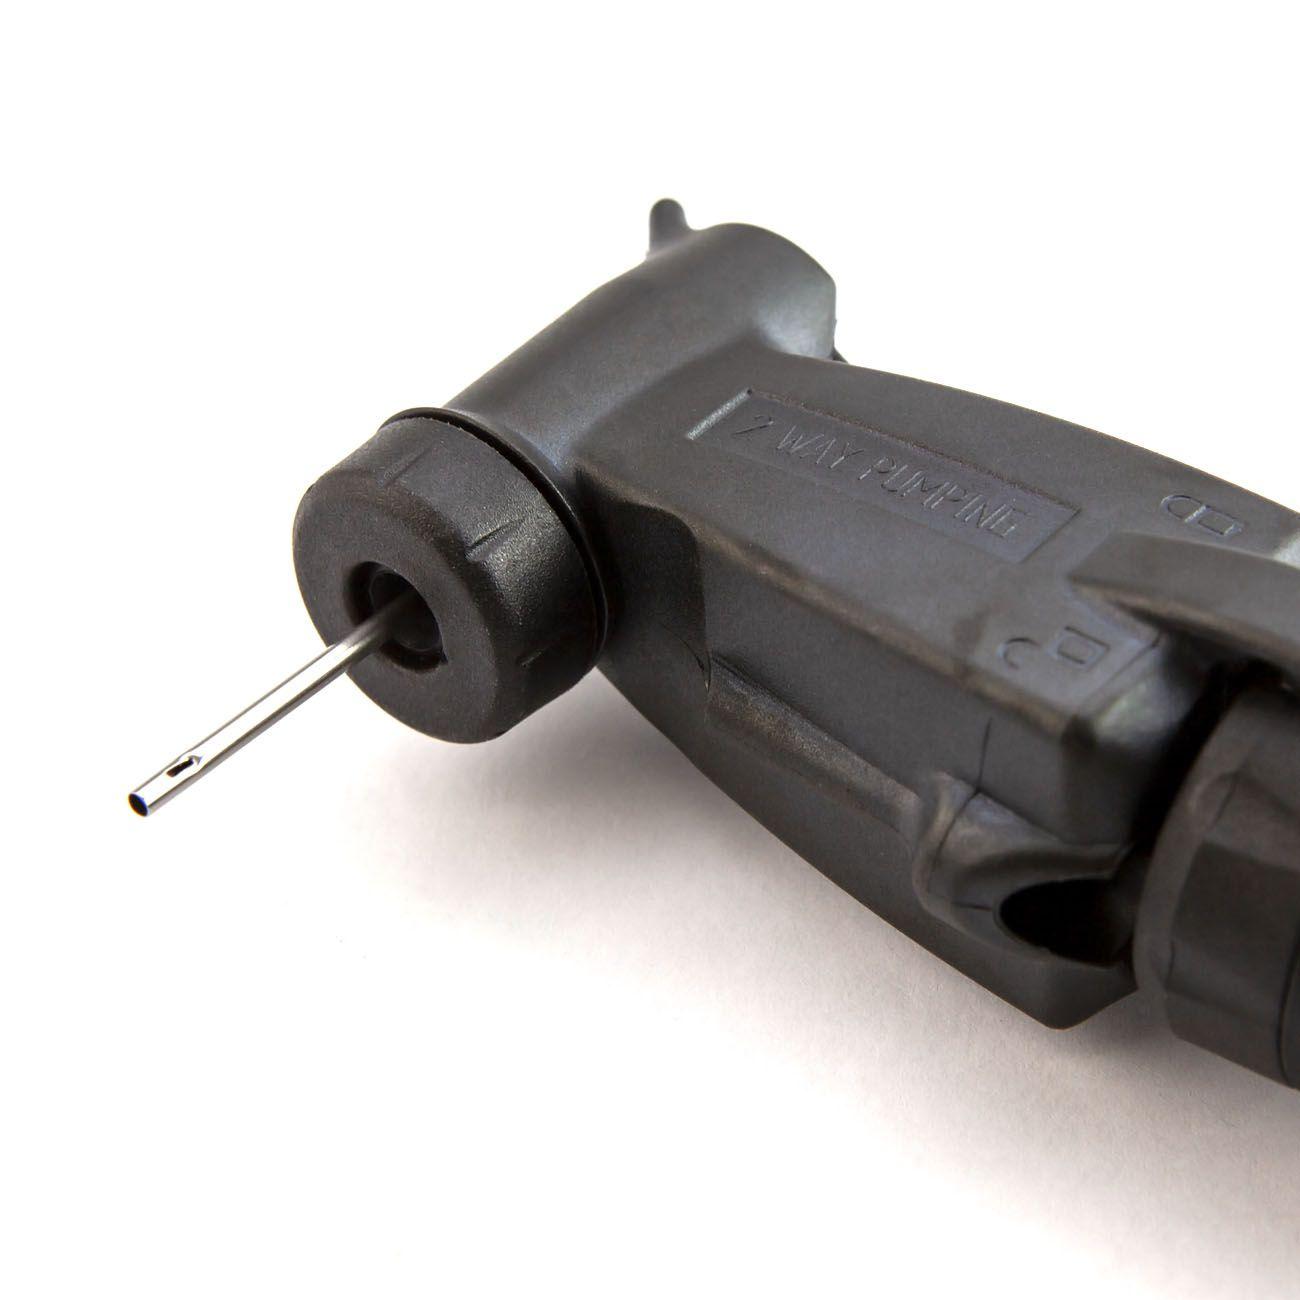 Mini Bomba de Ar WS-283 + Kit Reparo Pneu Bike SF-230  - Comprando & Pescando